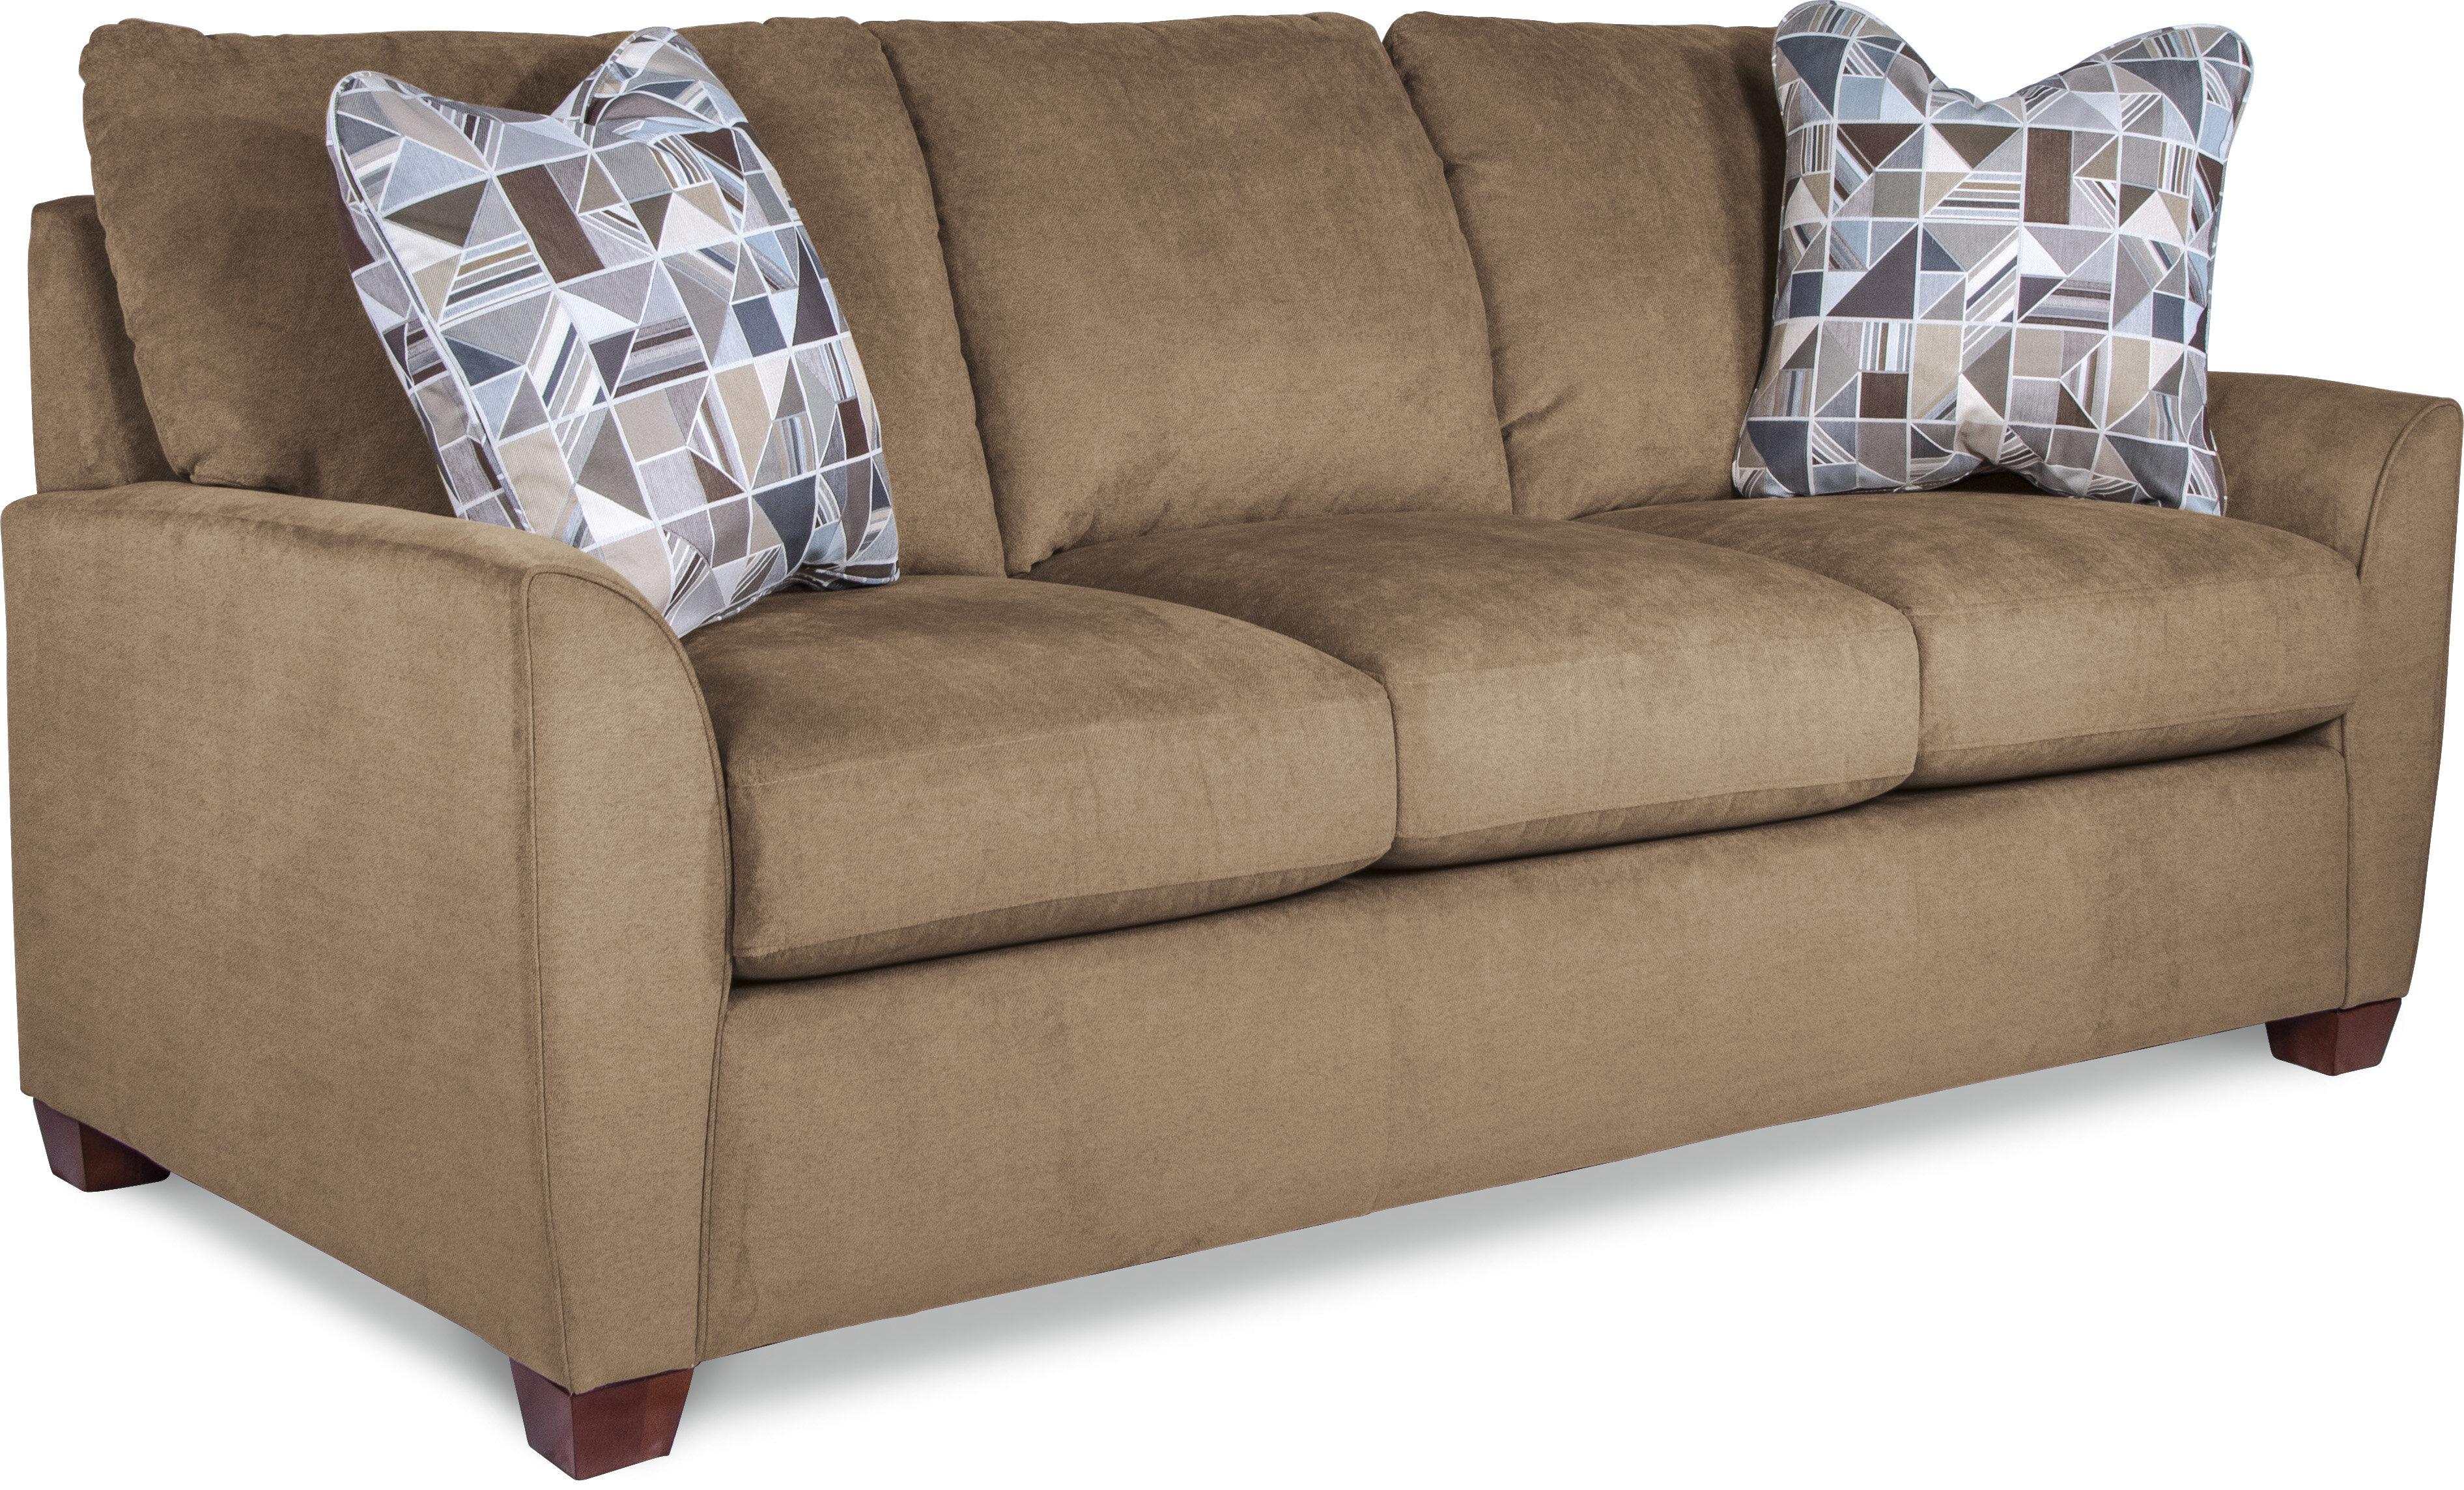 Brilliant Amy Premier Supreme Comfort Sofa Sleeper Theyellowbook Wood Chair Design Ideas Theyellowbookinfo